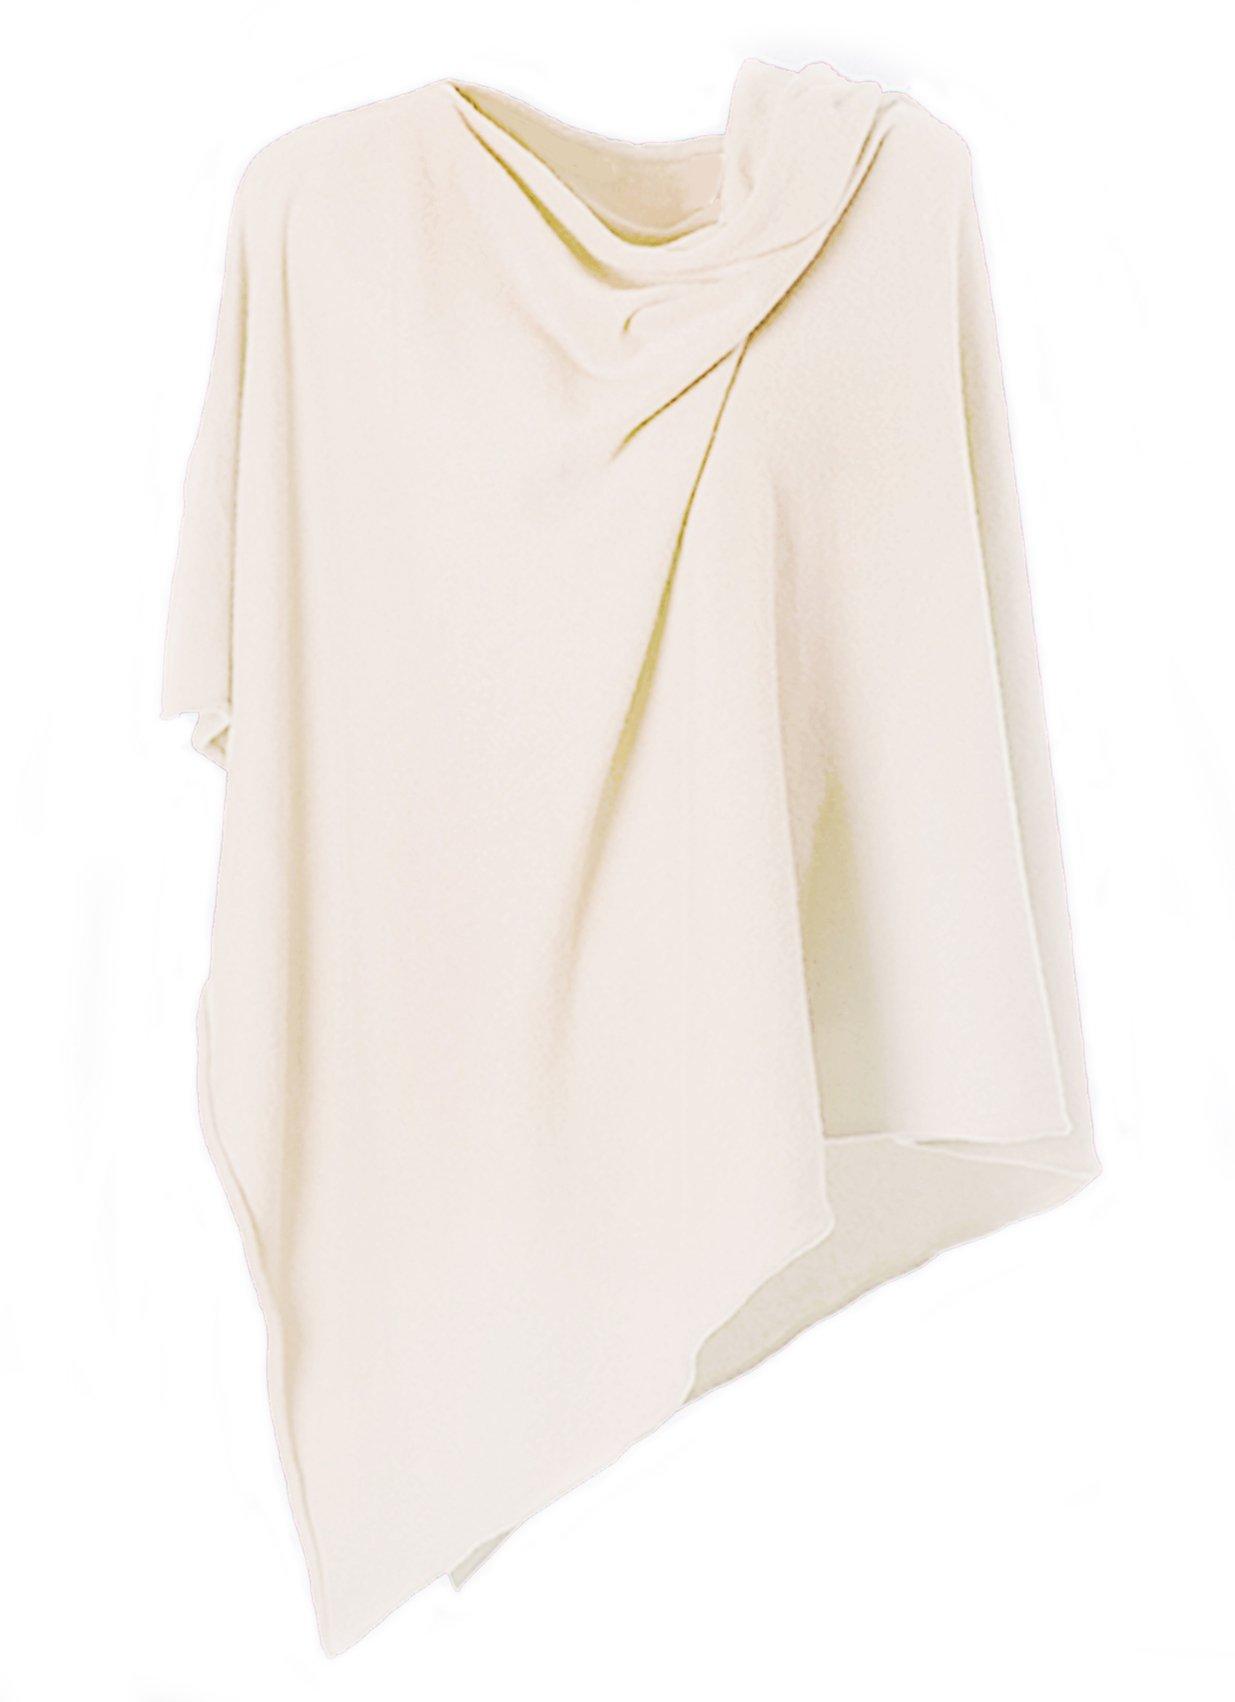 Anna Kristine Asymmetrical 100% Cashmere Draped Poncho Topper - Cream by Anna Kristine